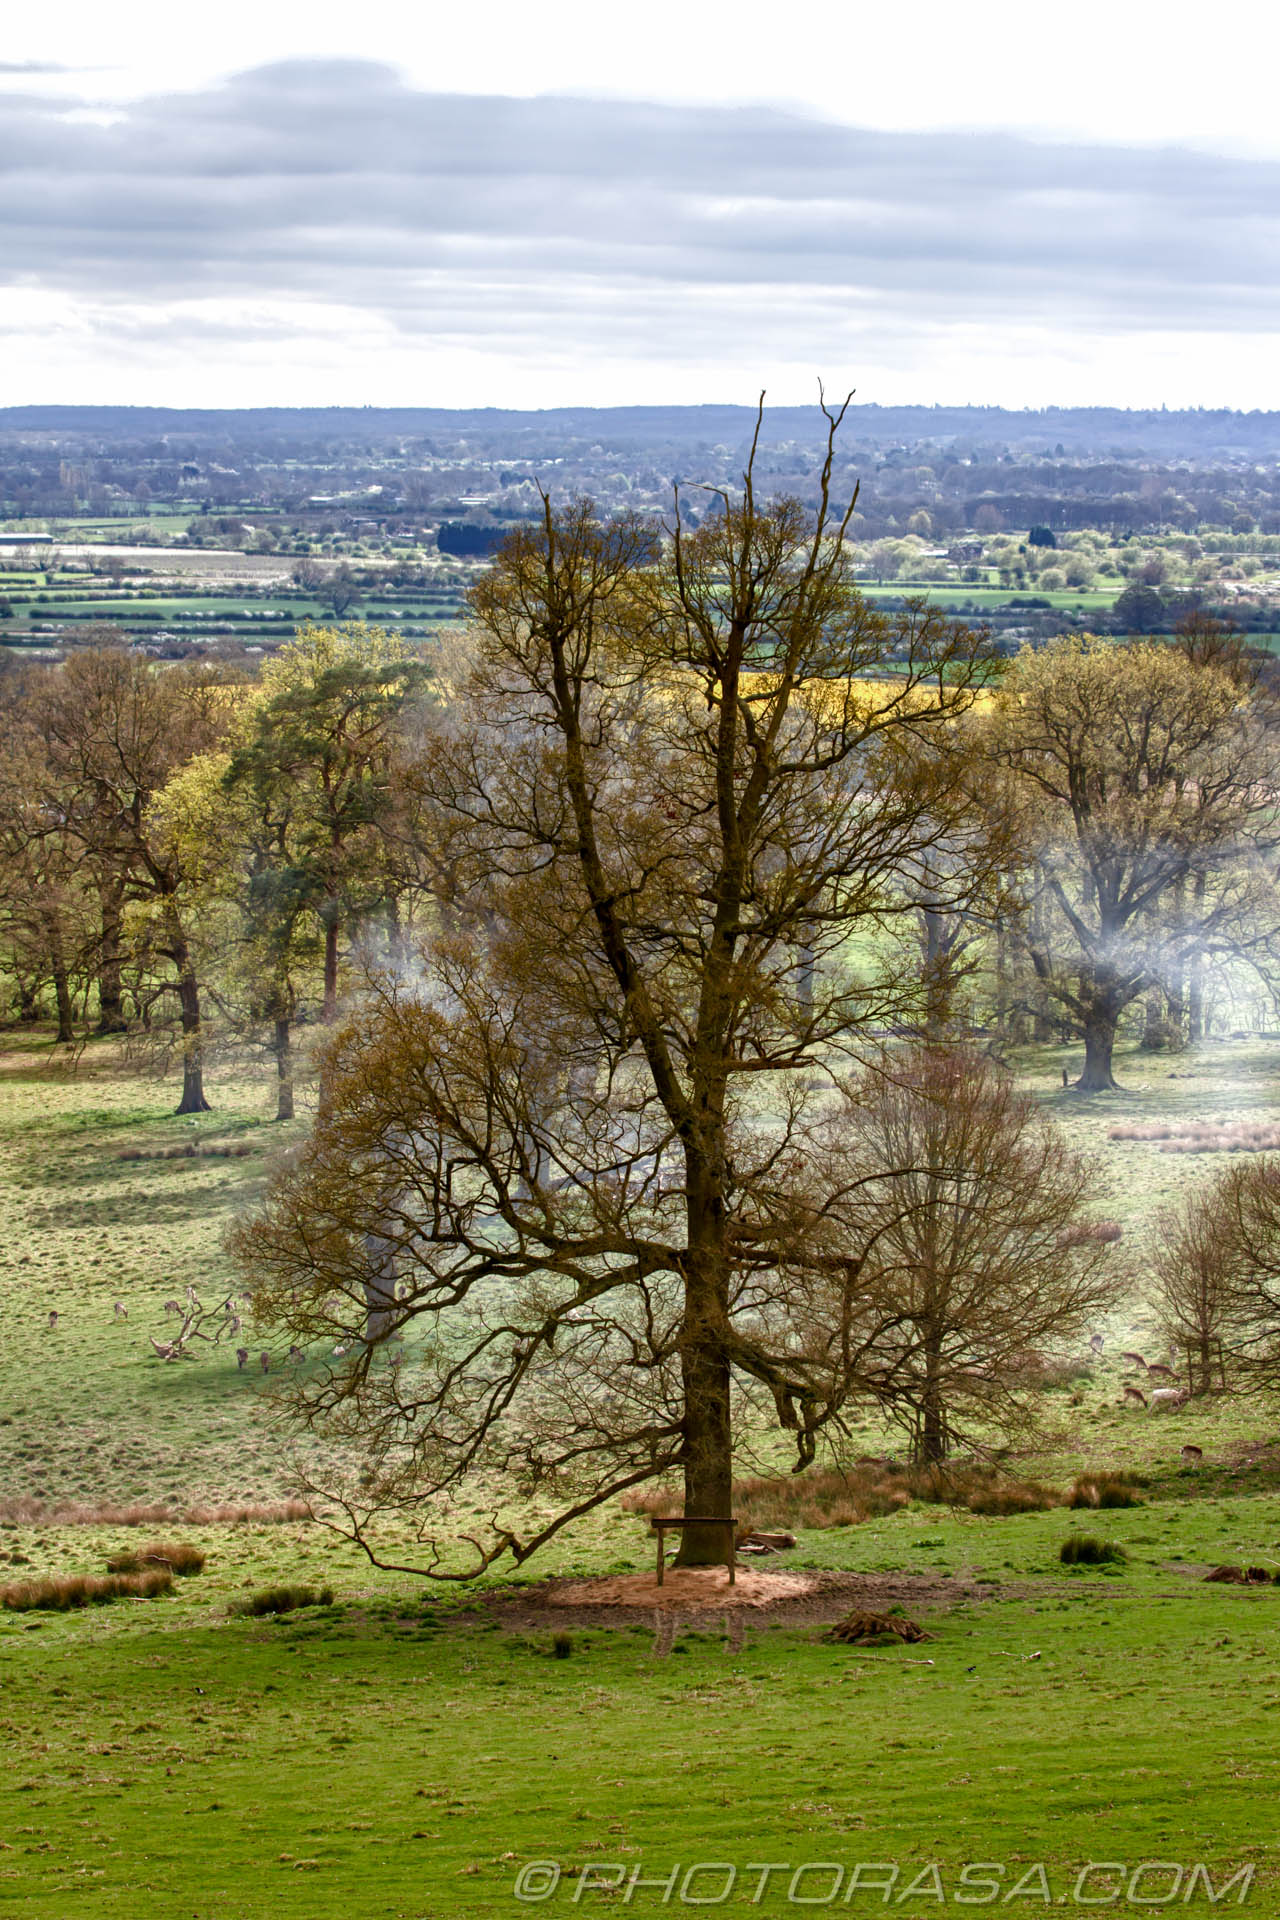 https://photorasa.com/view-boughton-monchelsea-churchyard/large-oak-in-deer-park/